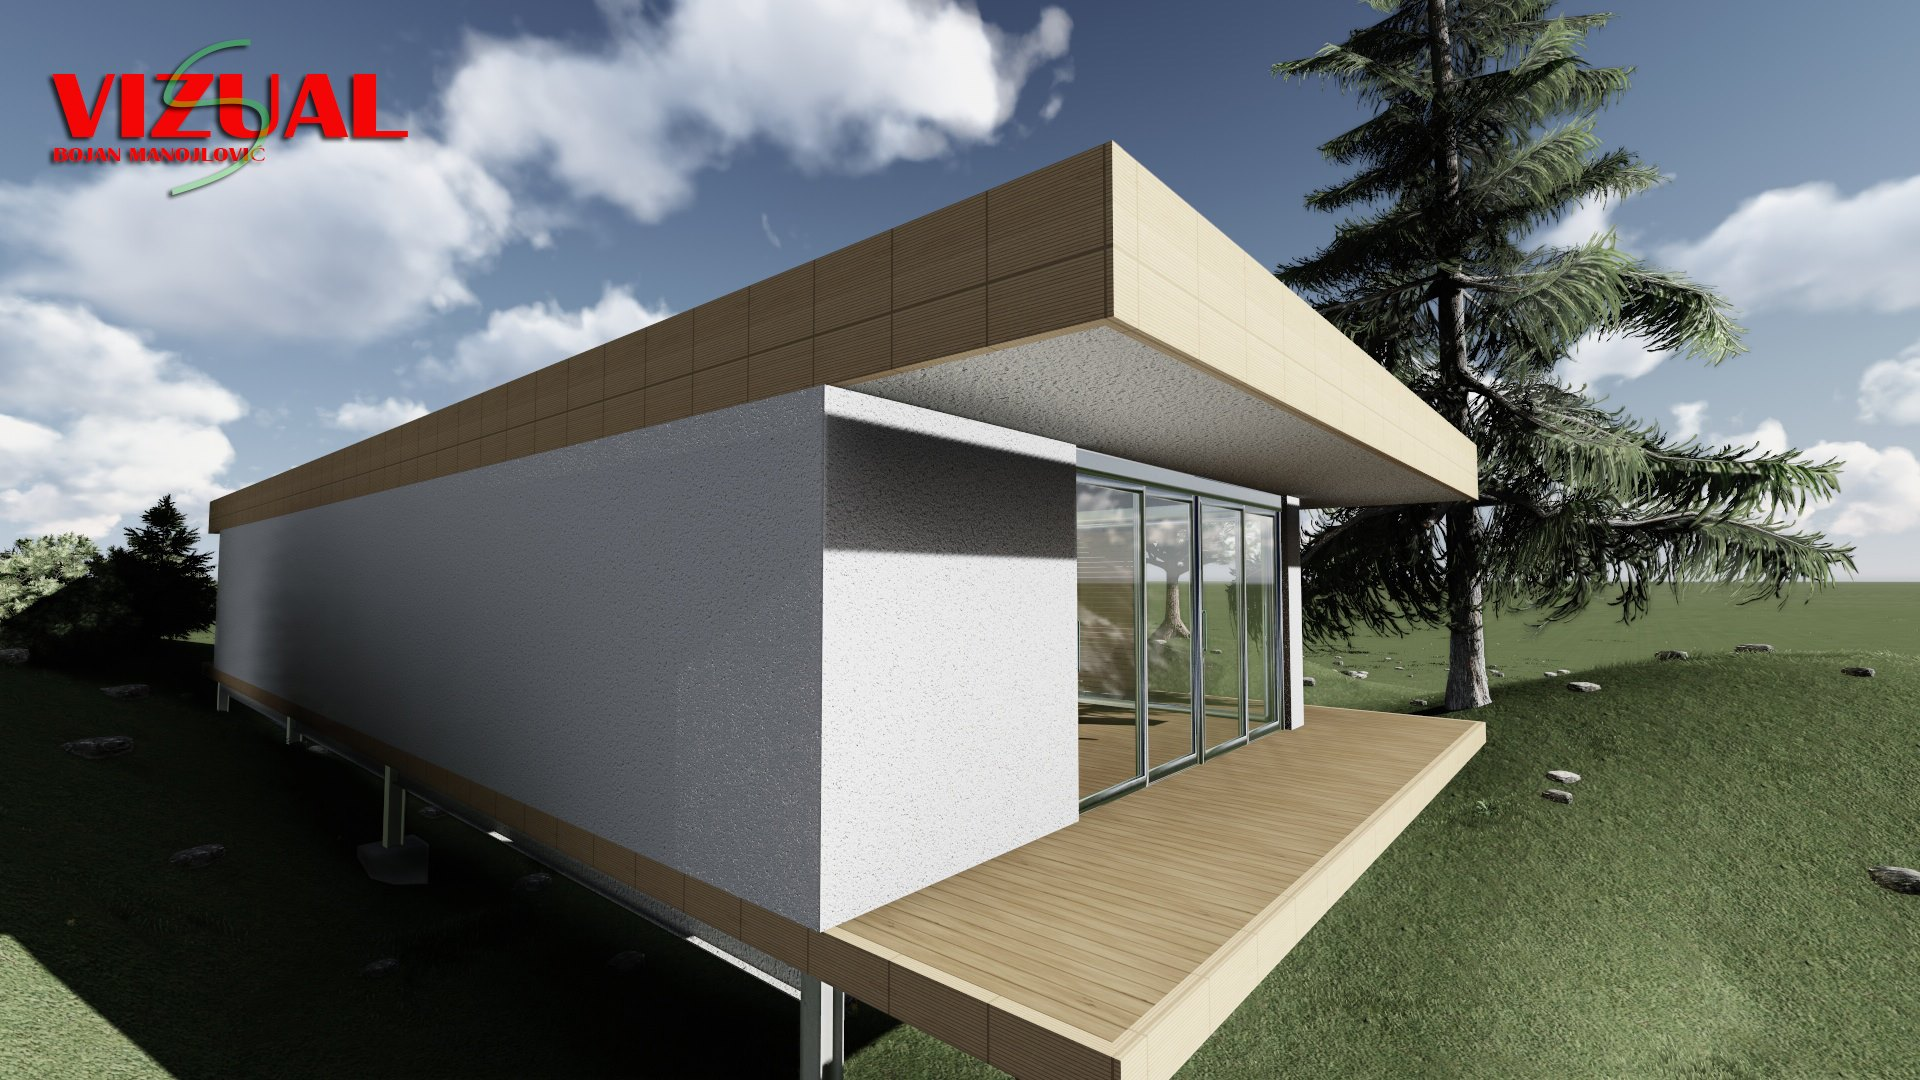 Idejna rešenja, 3d vizualizacija, 3d modelovanje, projektovanje, Kruševac, Srbija, Bojan Manojlović, VIZUAL S,